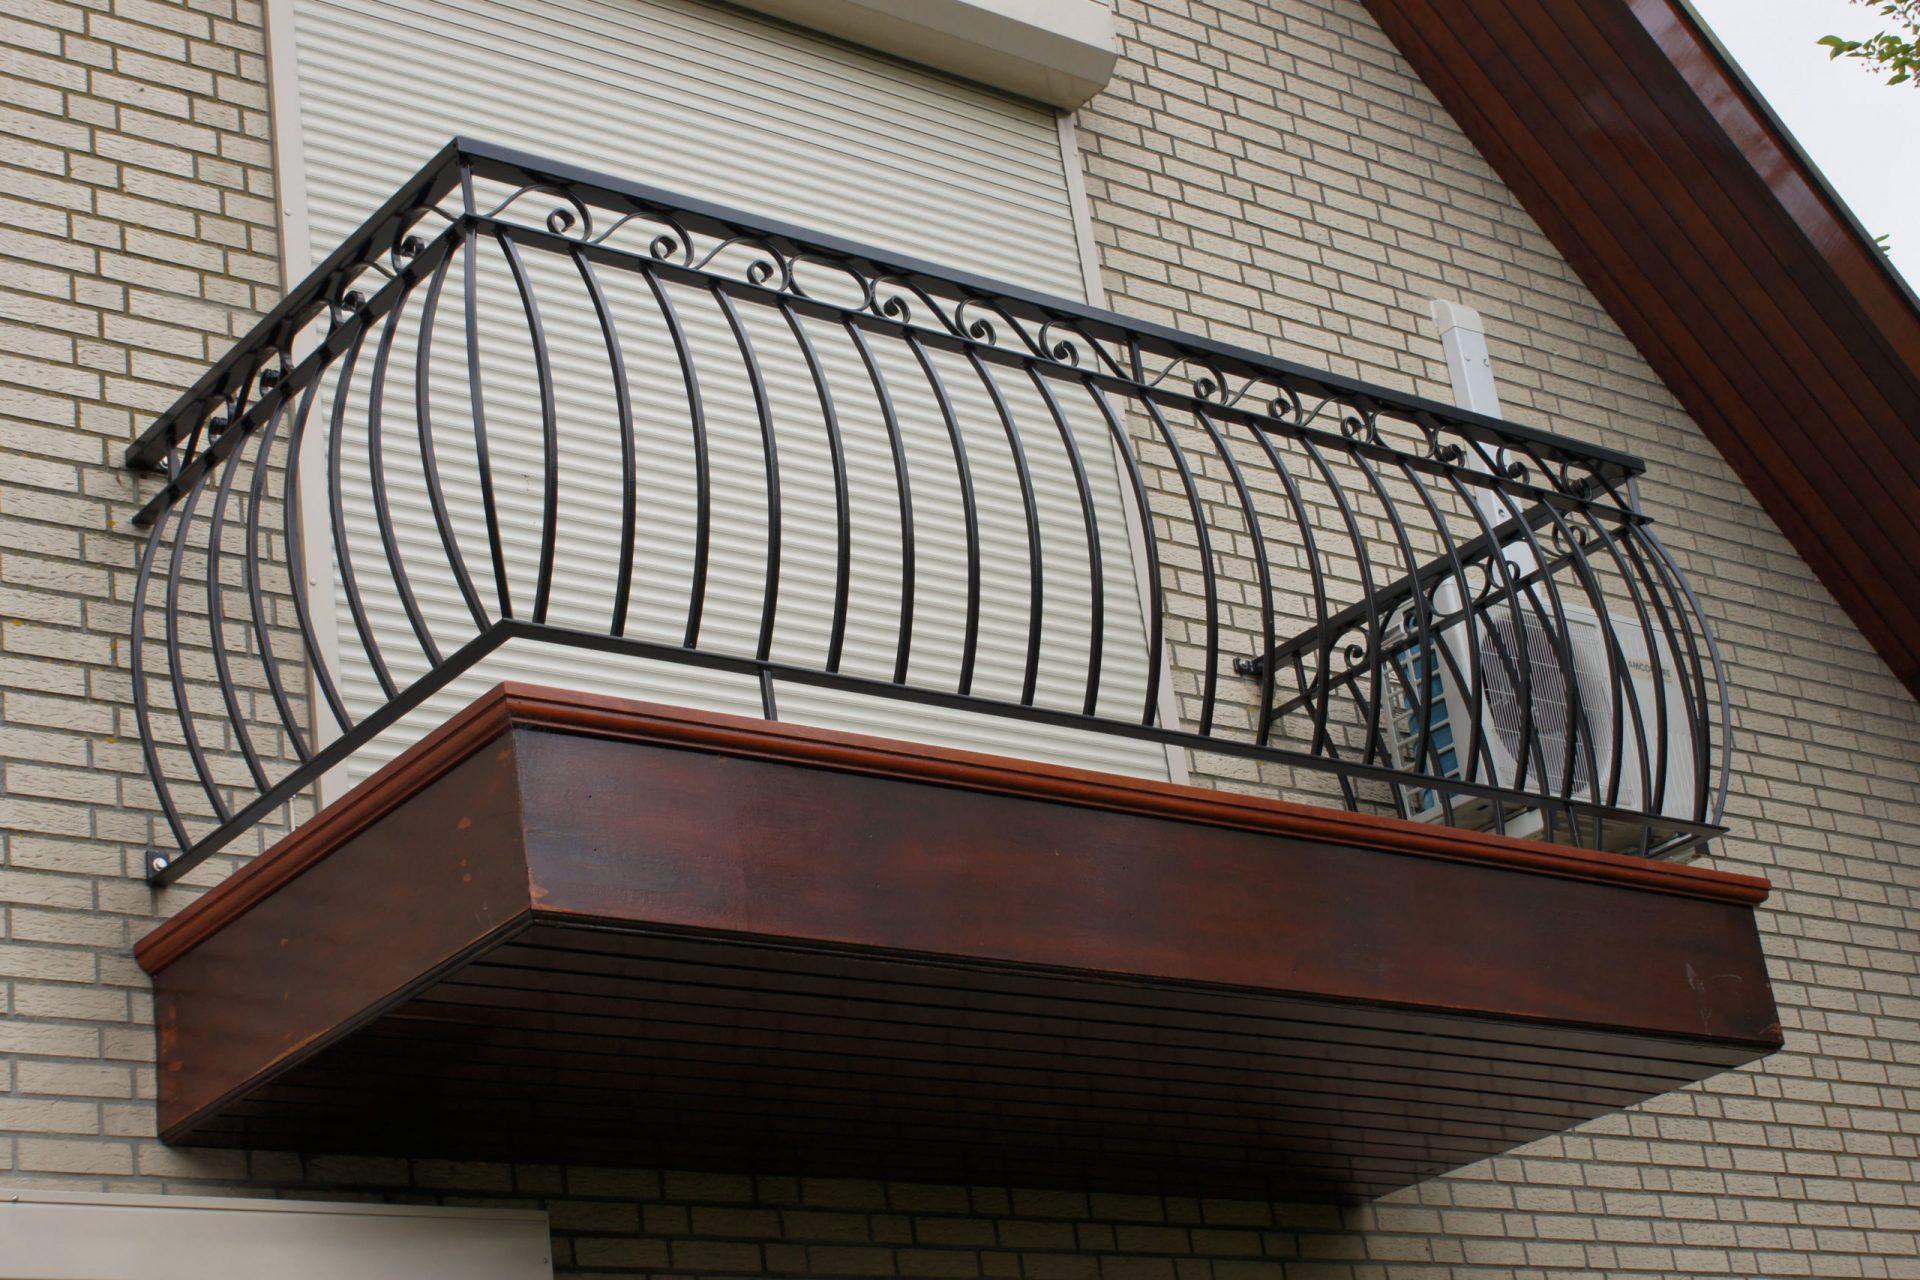 balkonhekwerk klassiek